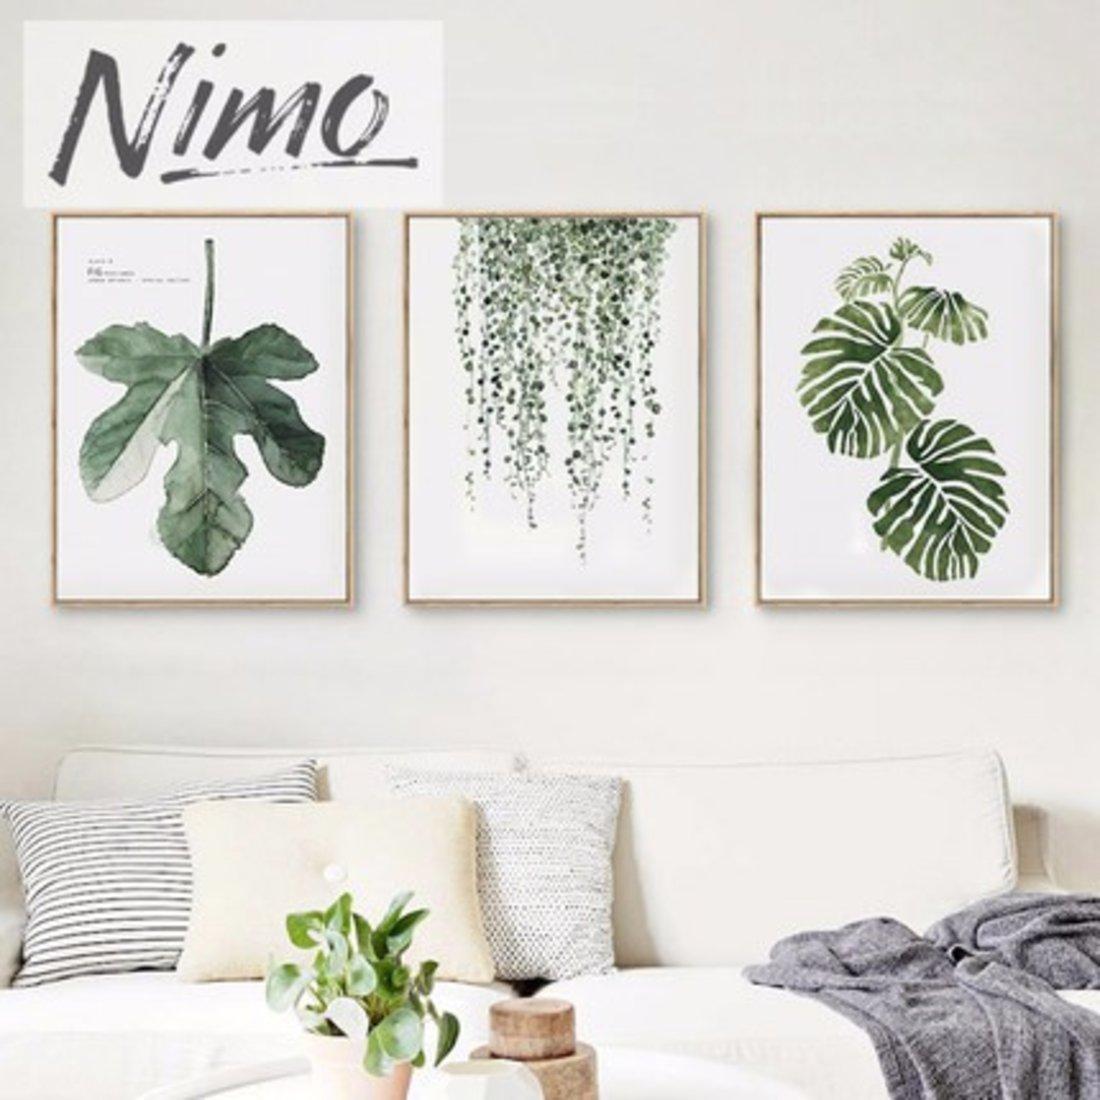 Nimo尼摩 北欧简约沙发背景墙画客厅饰画卧室餐厅壁画小清新绿植